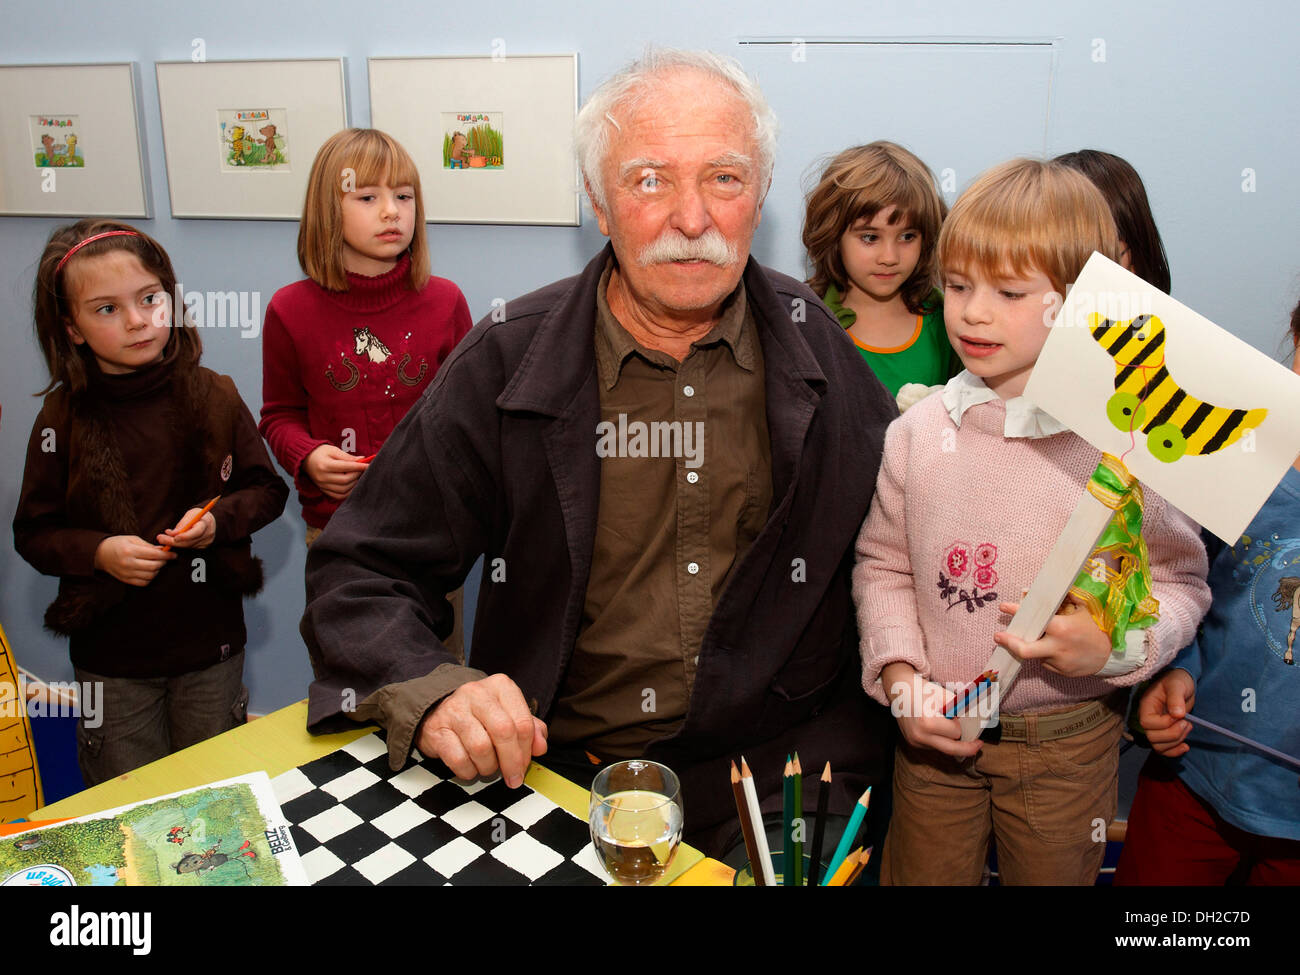 The Illustrator Children S Book Author And Writer Janosch